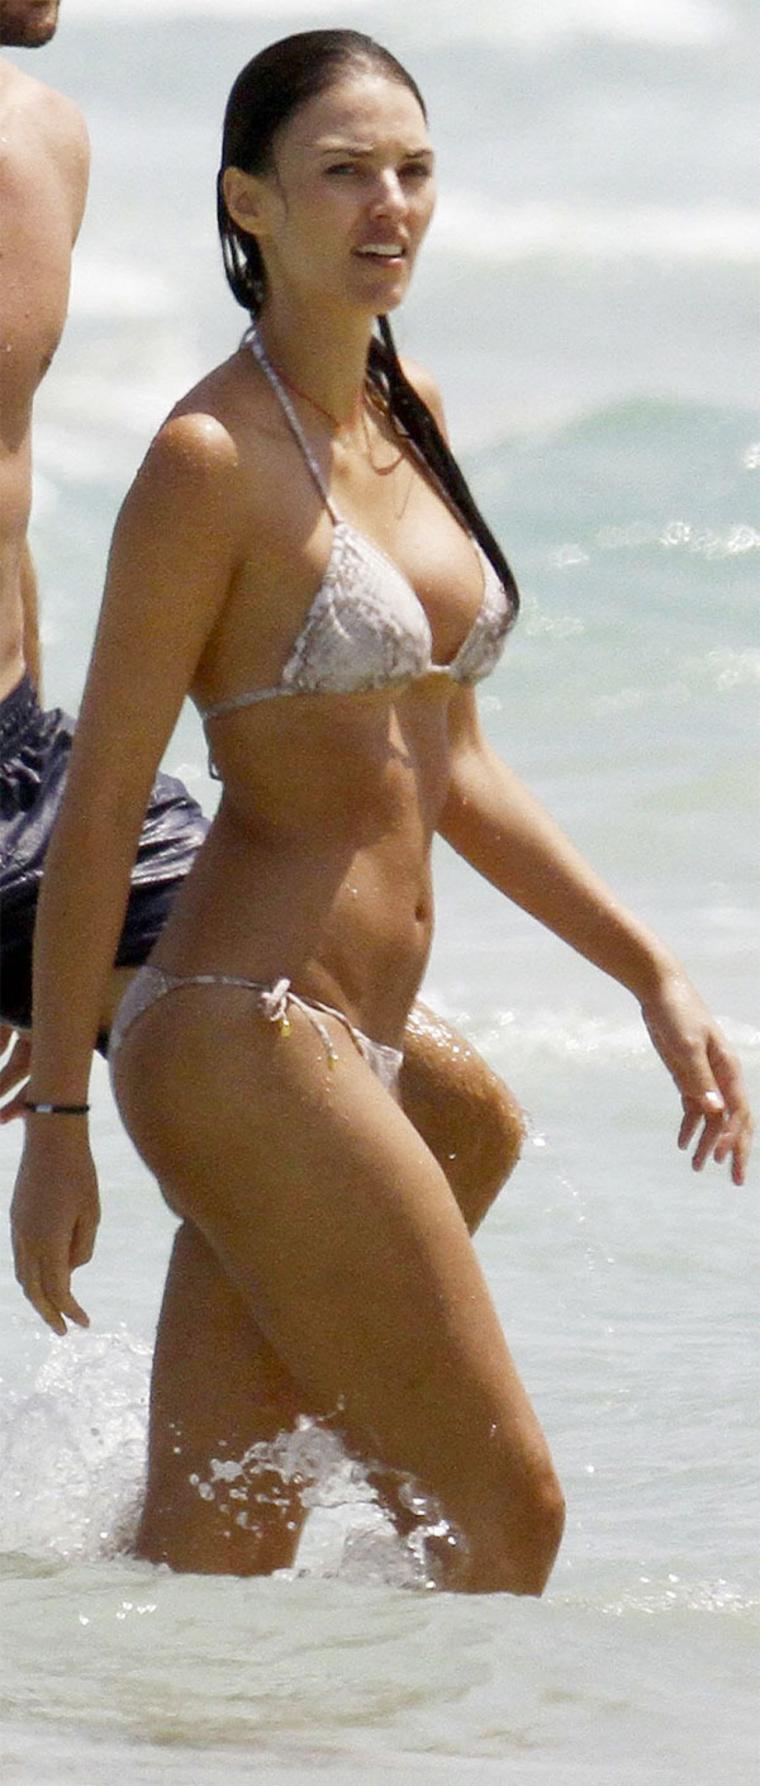 Uncategorized 2011 : helen-lindes-bikini-candids-in-ibiza-06